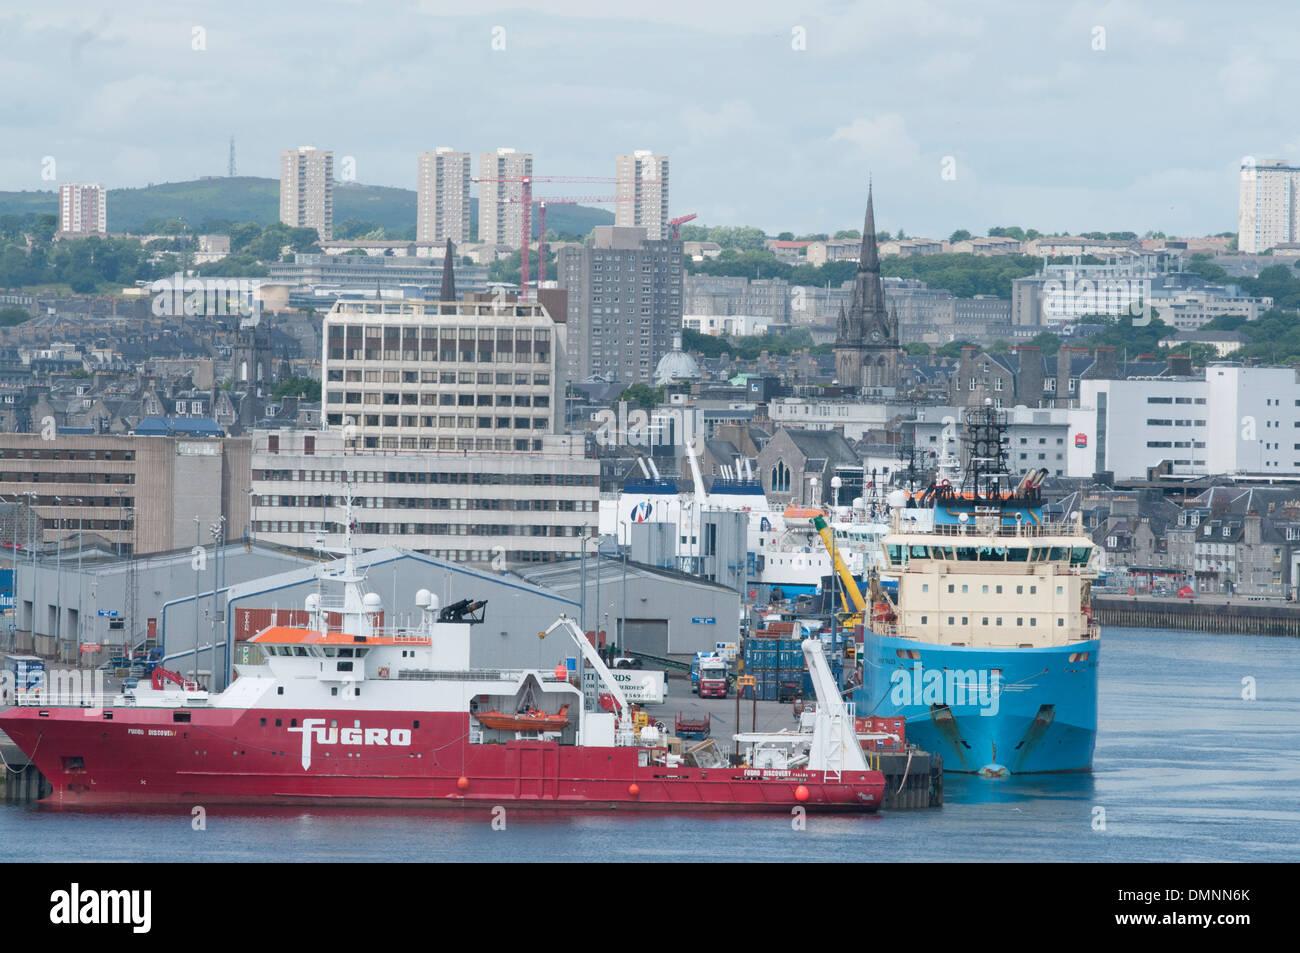 survey dock aberdeen granite city marine engineering - Stock Image